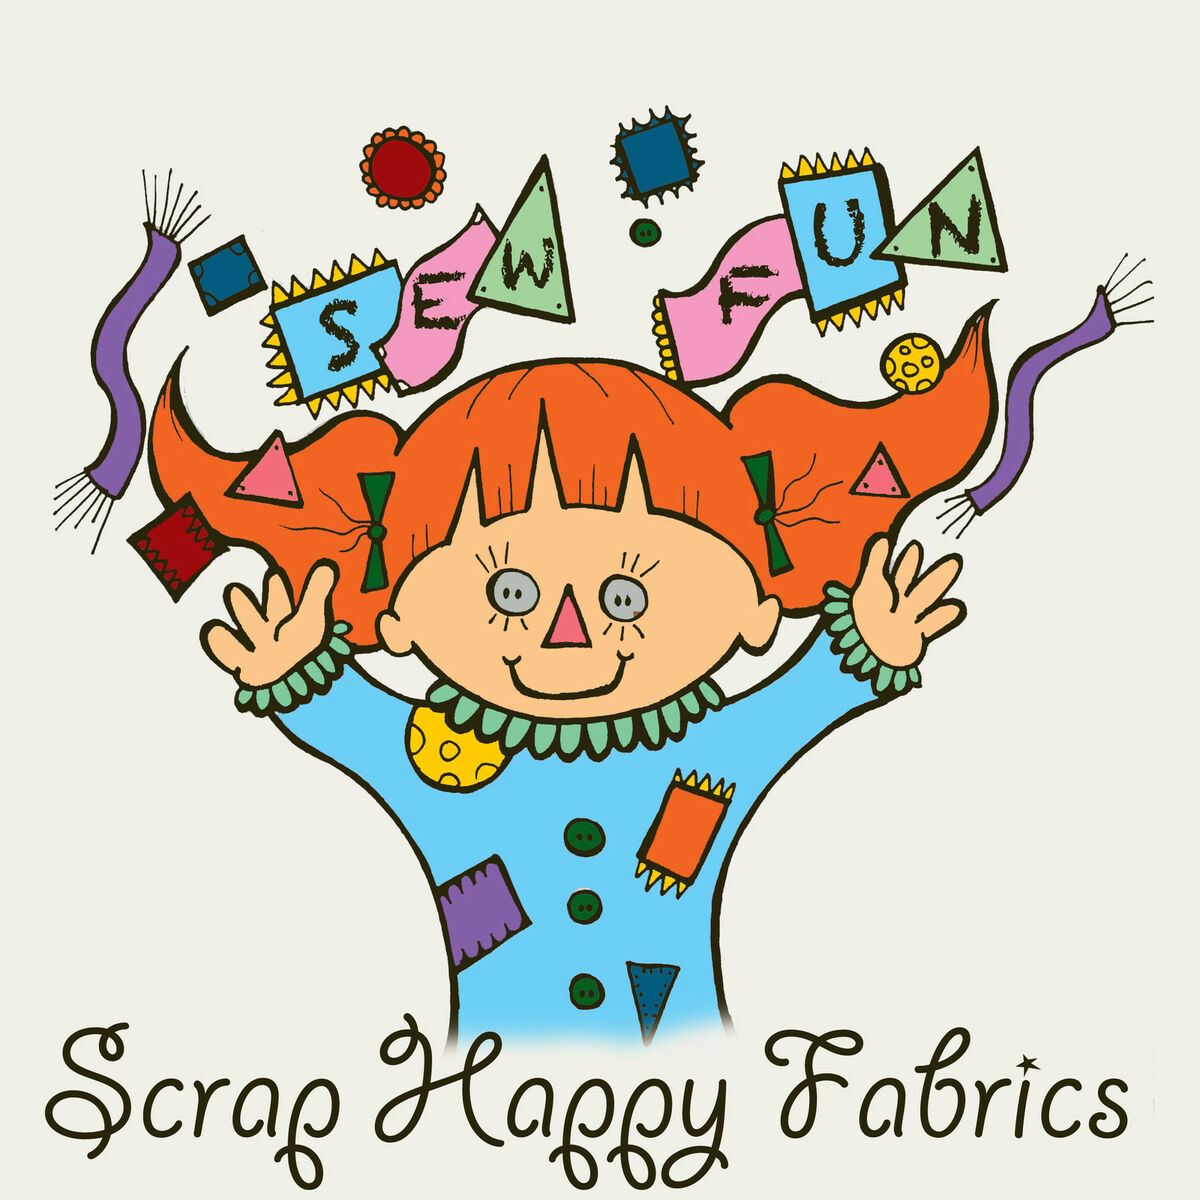 Your Scrap Happy Fabrics